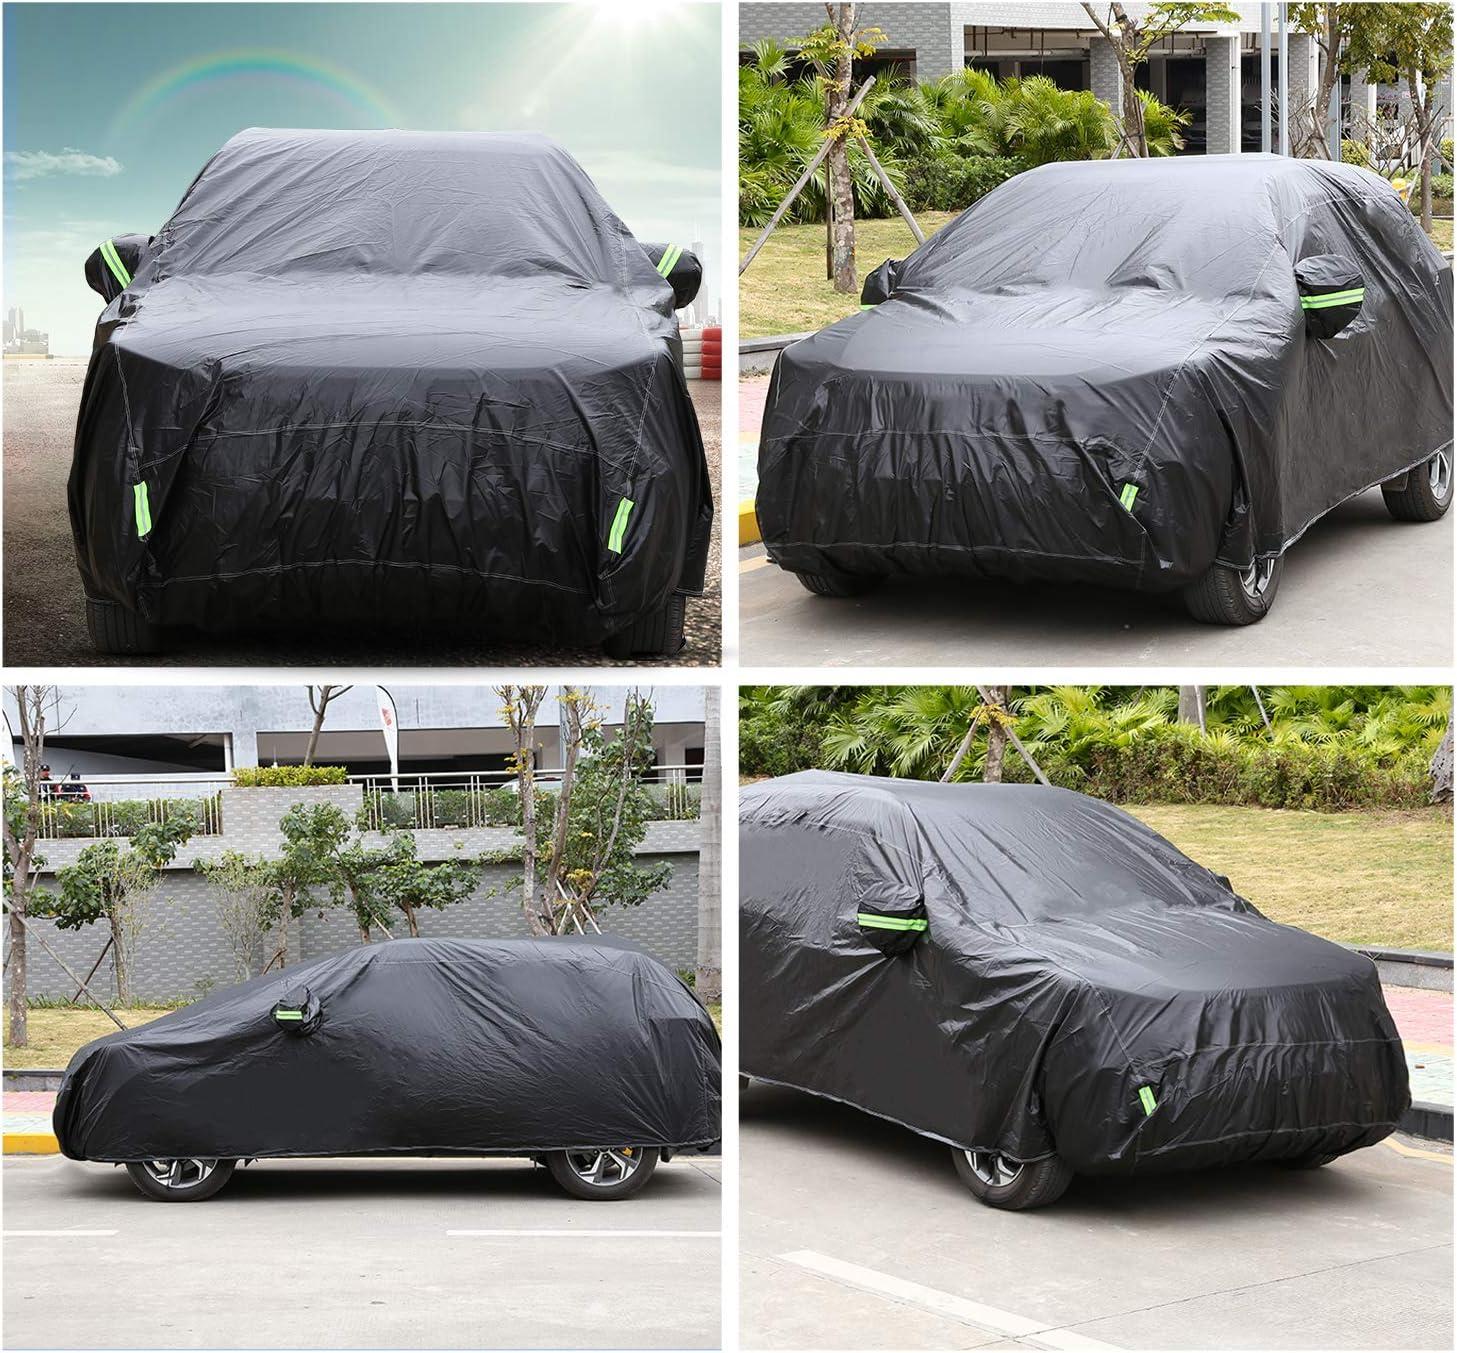 485x185x150cm//Sedan/_S//210T Homdox Funda de Coche Impermeable 210T Cubierta de Coche Anti-UV Antipolvo y Rasgu/ño